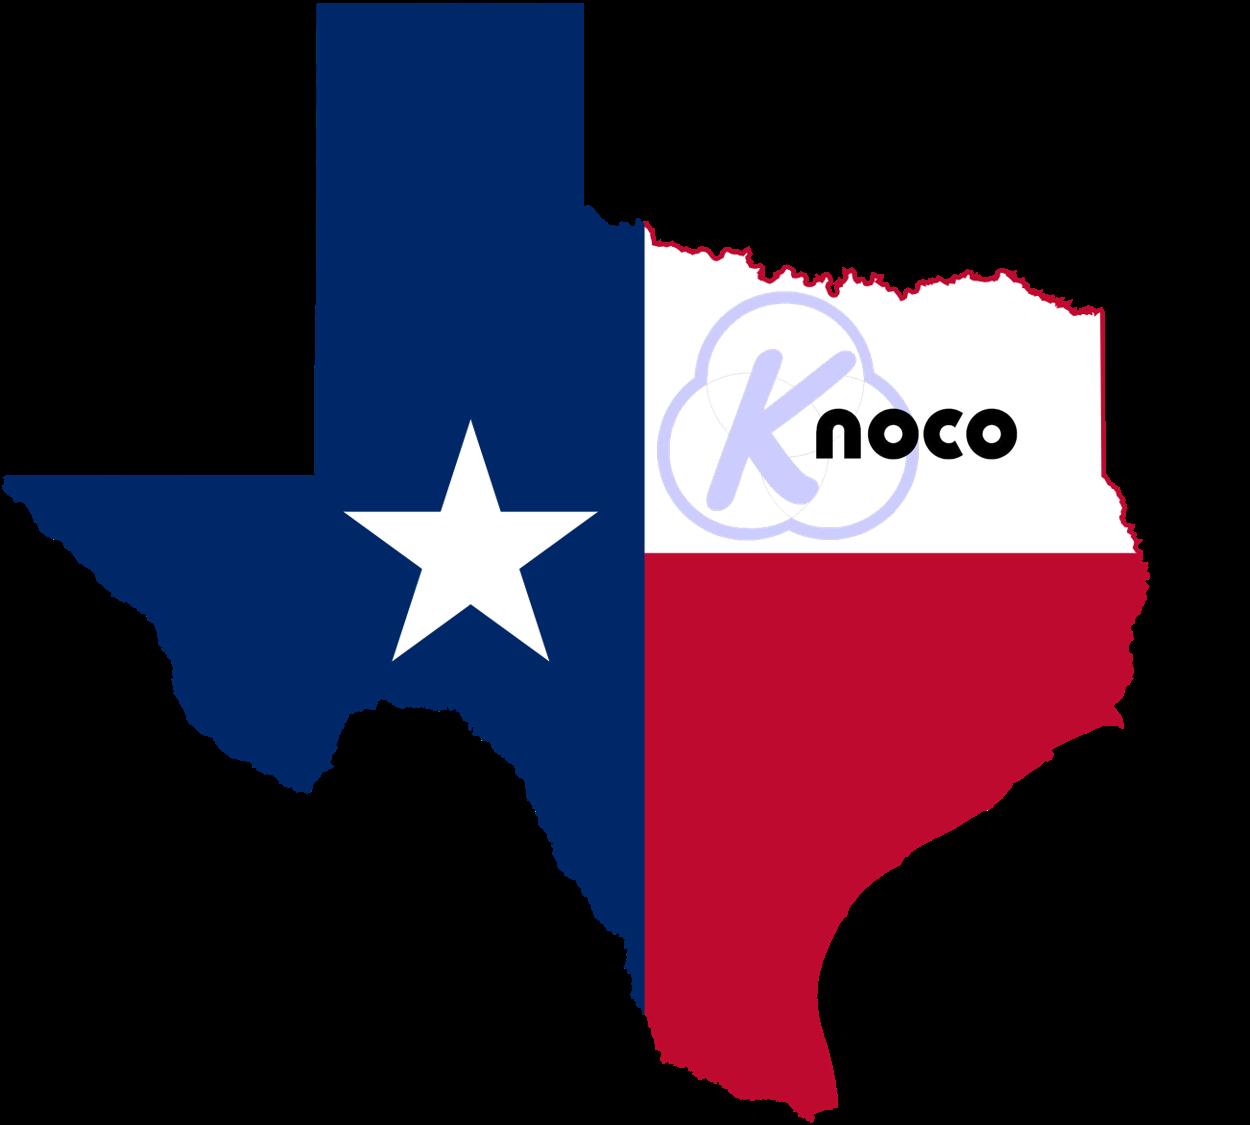 Logo KnocoTexas